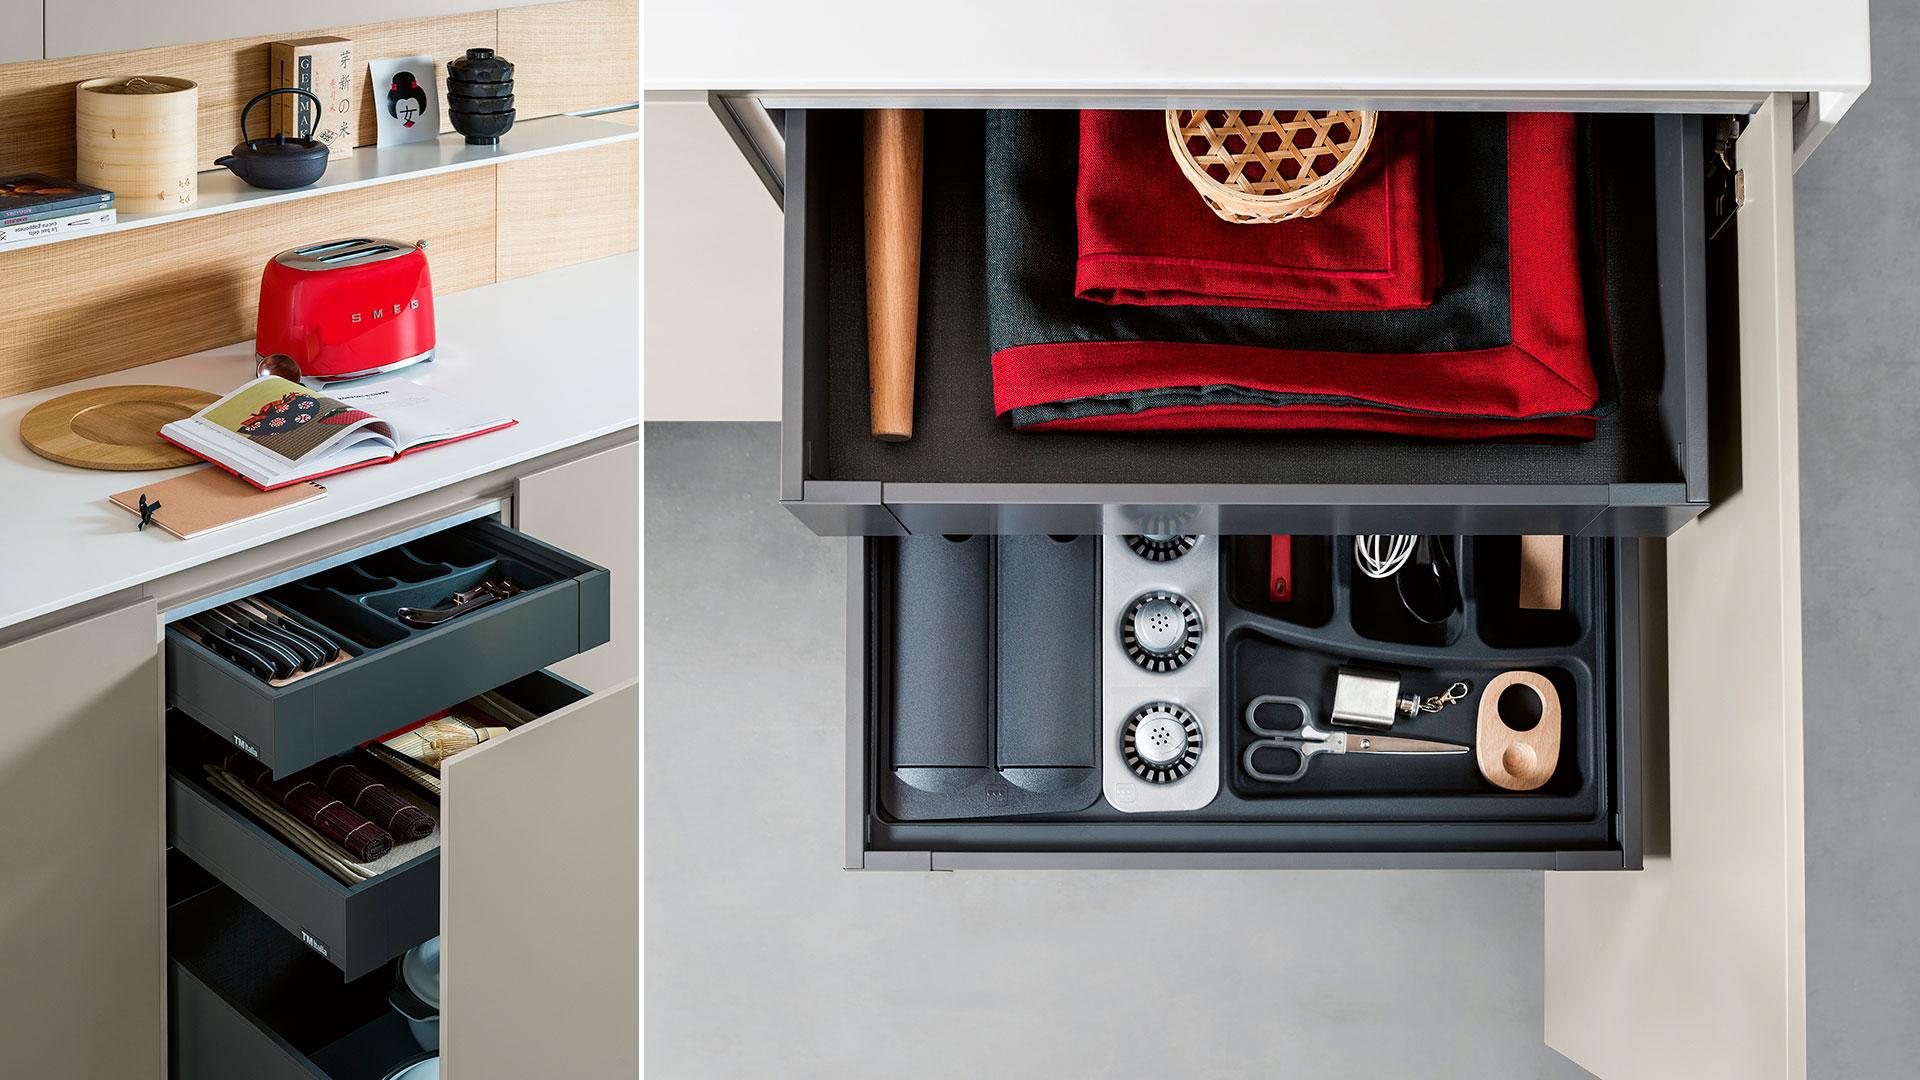 Cucina moderna freestanding in corian K6 | Collezioni Cucine 2018 TM Italia - TM_CAT_K6_004